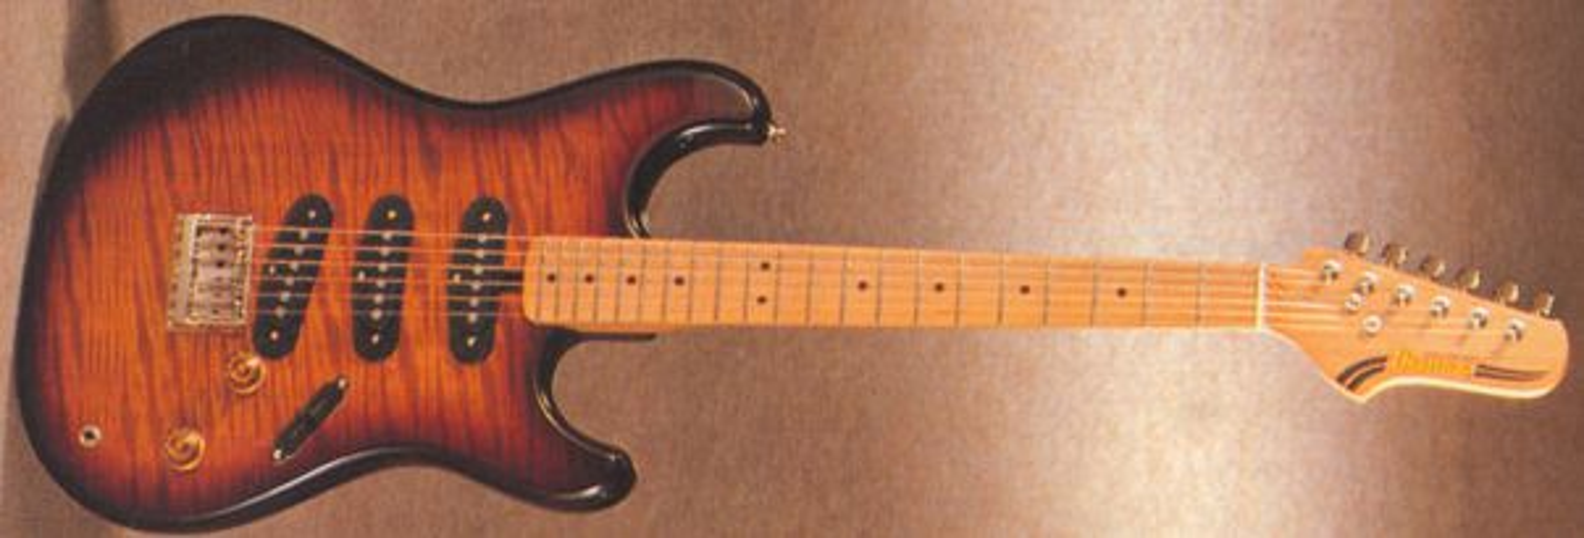 RS100 (1979–1980)